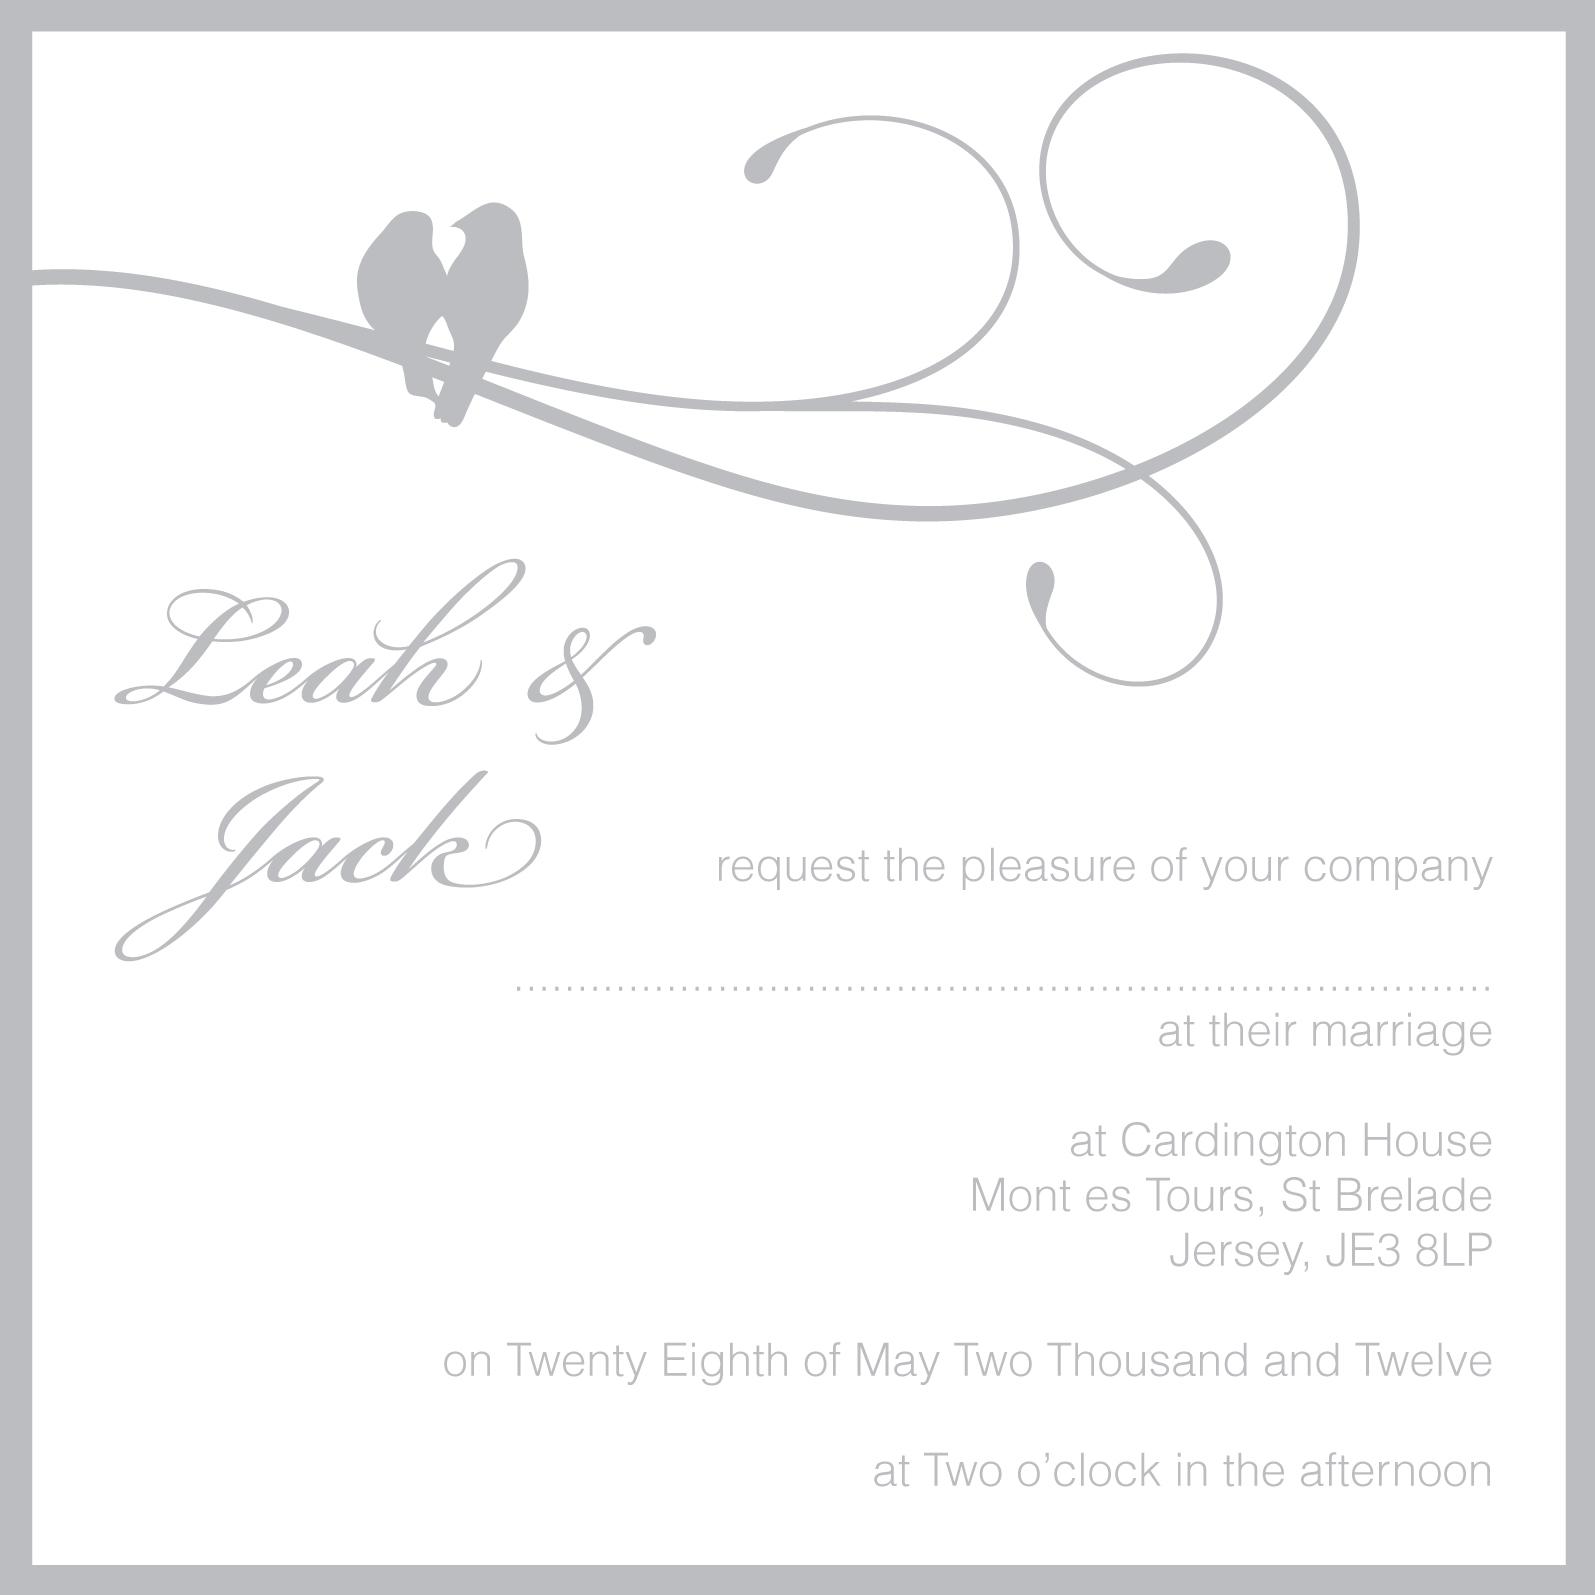 grey birdcage theme wedding invitation grey wedding invitation with two birds - What To Put On A Wedding Invitation